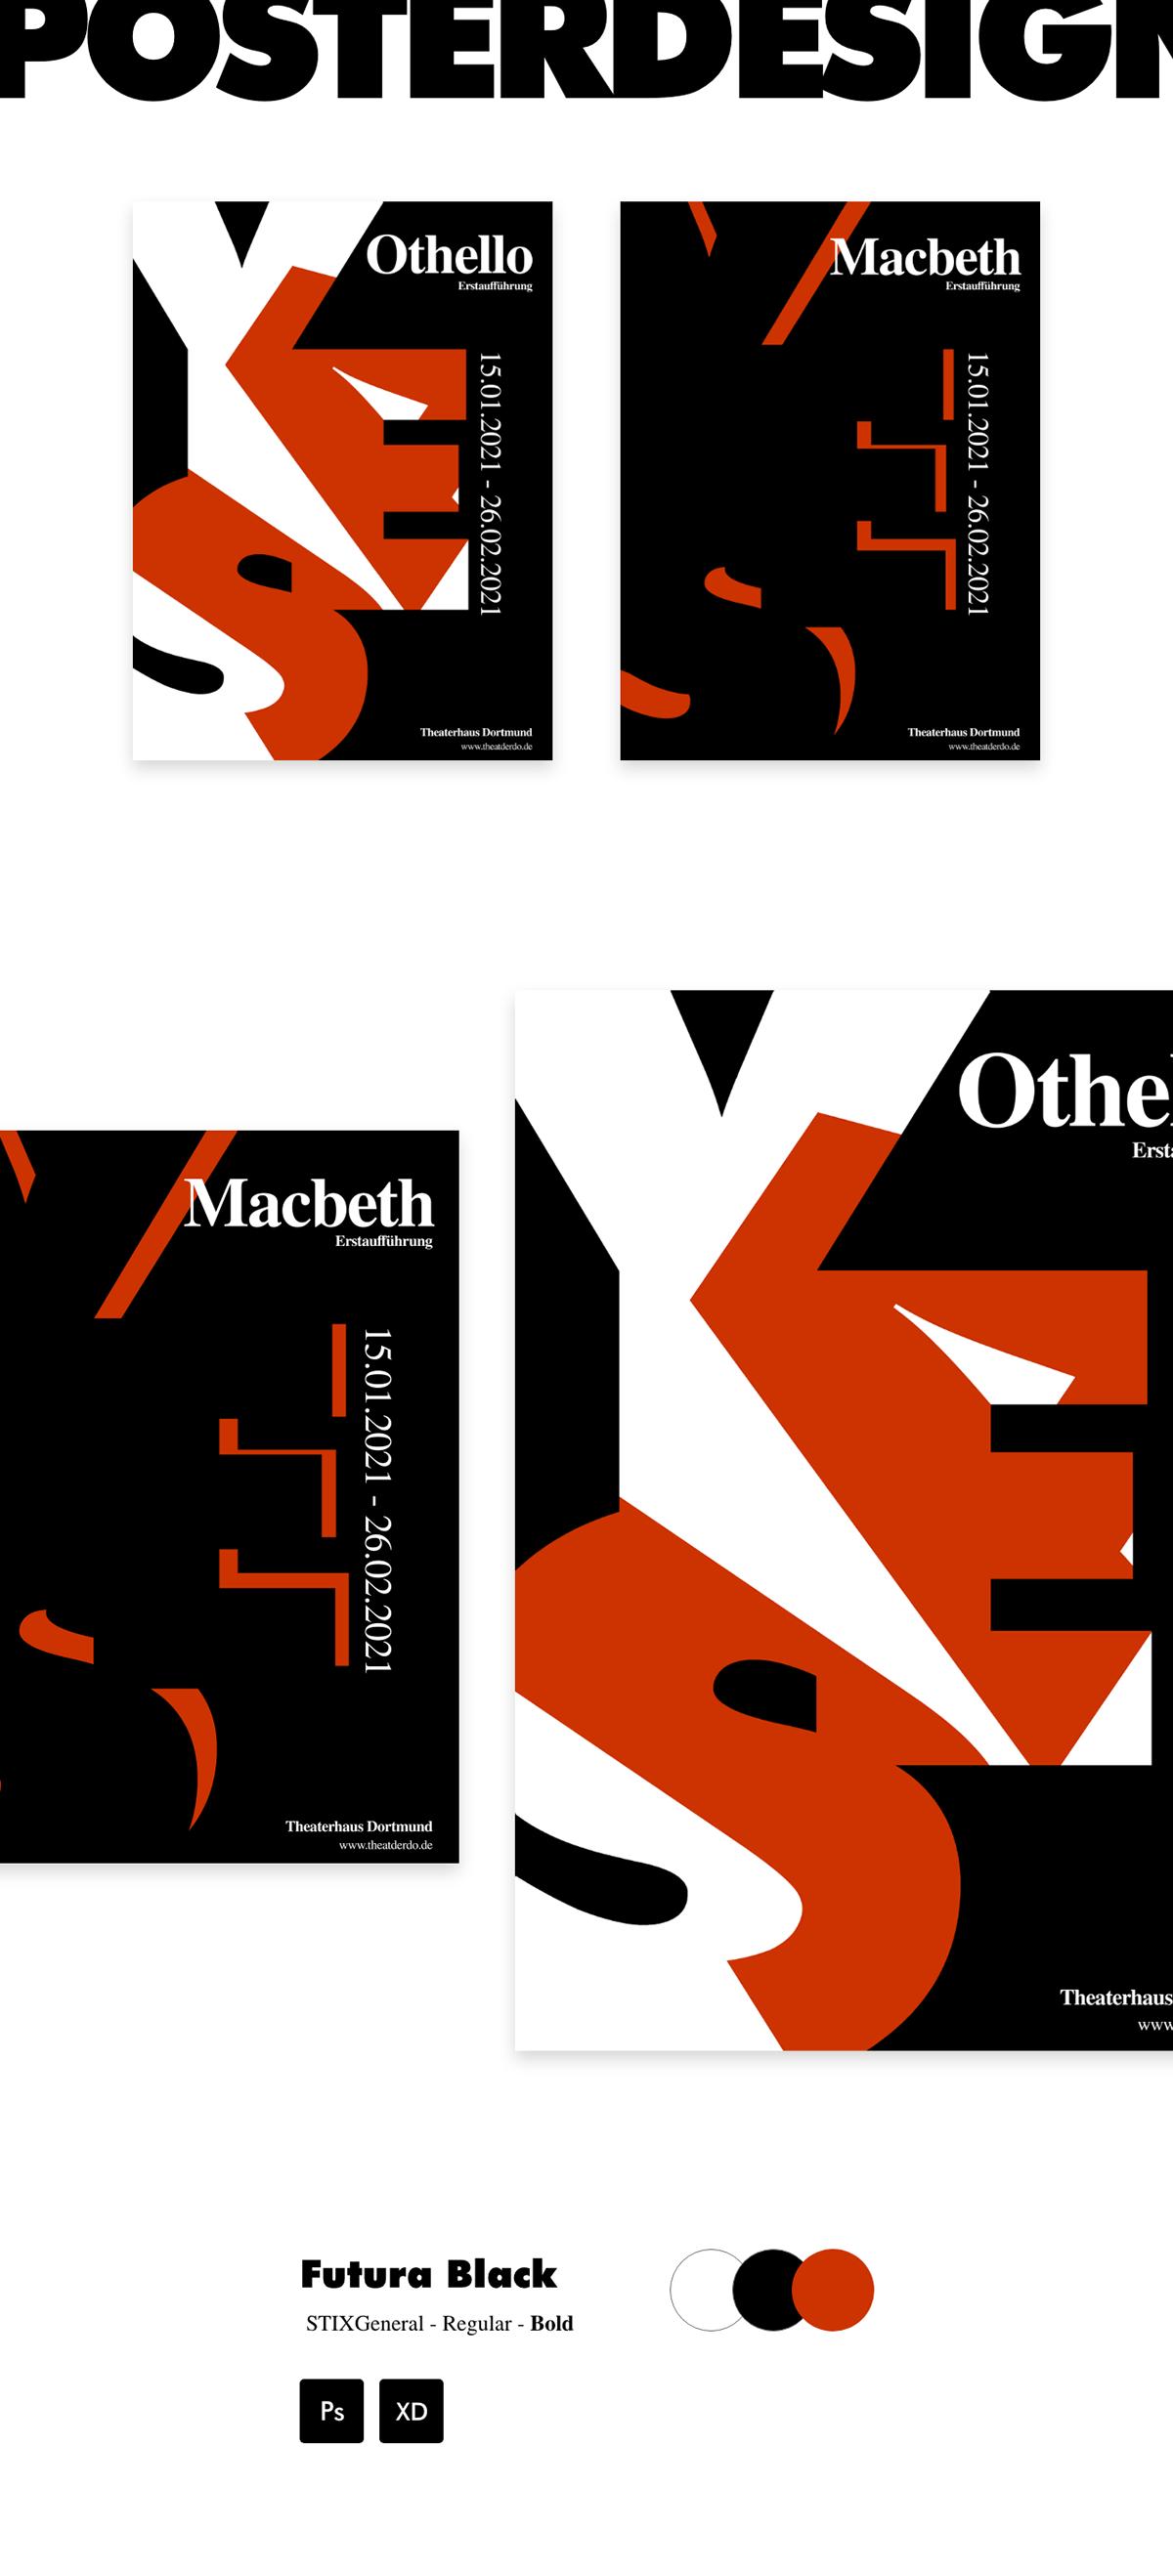 design grafik graphicdesign Minimalism poster posterdesign typografie Typographie visual VisualDesign